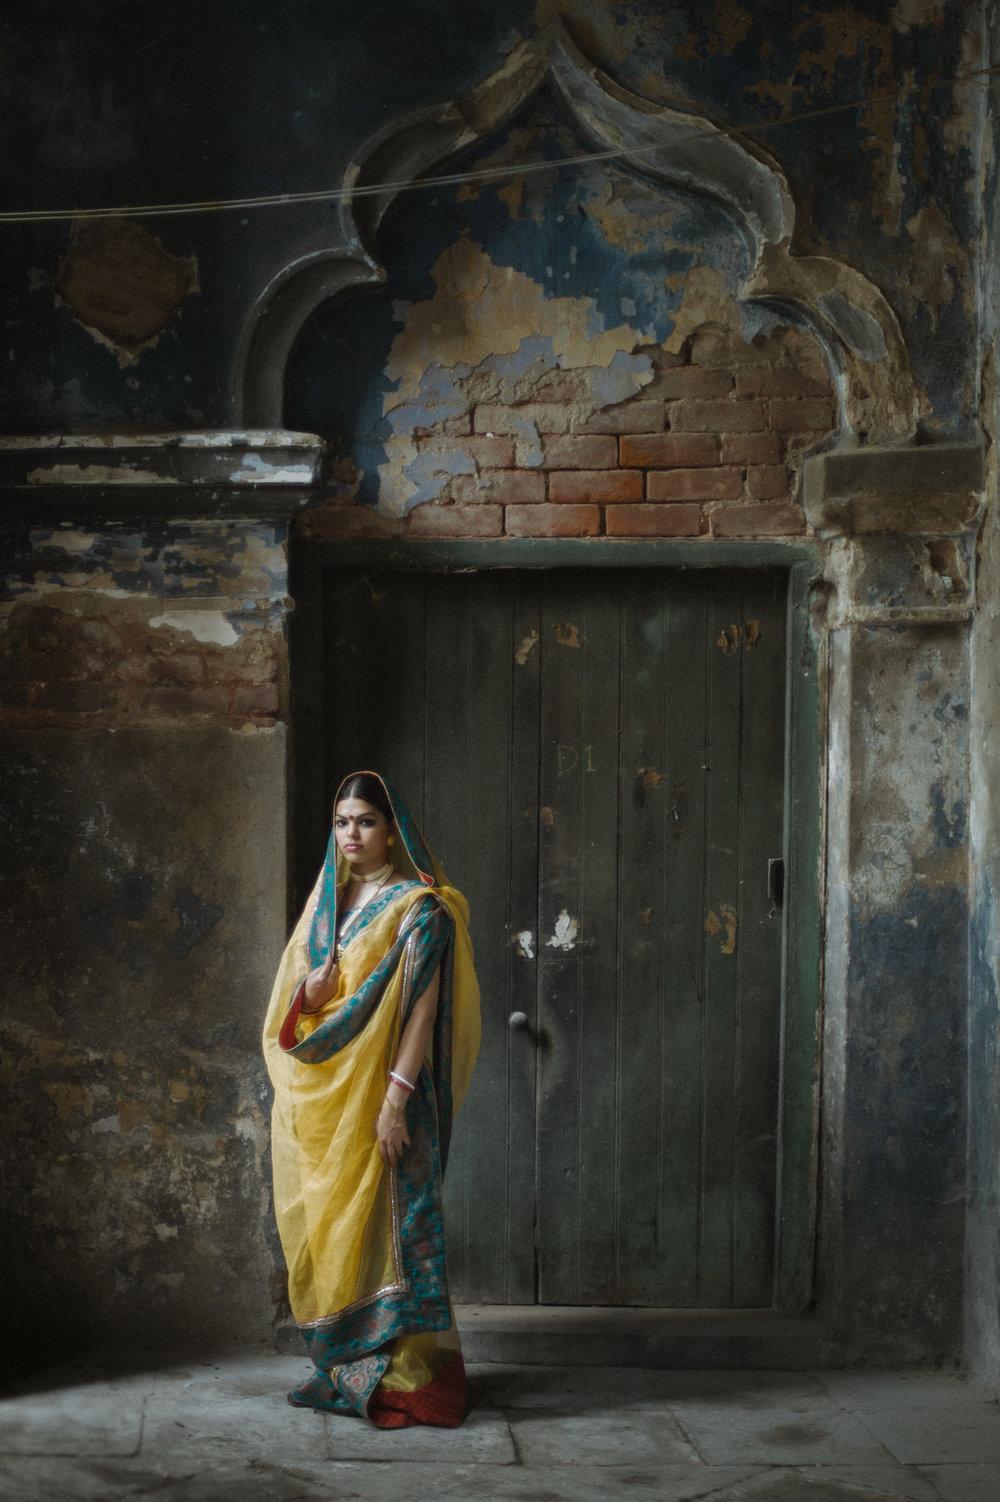 10_Chhandak Pradhan-fashion-Ruins and a Requiem-vintage_feudal_Indian_royal_portrait.jpg